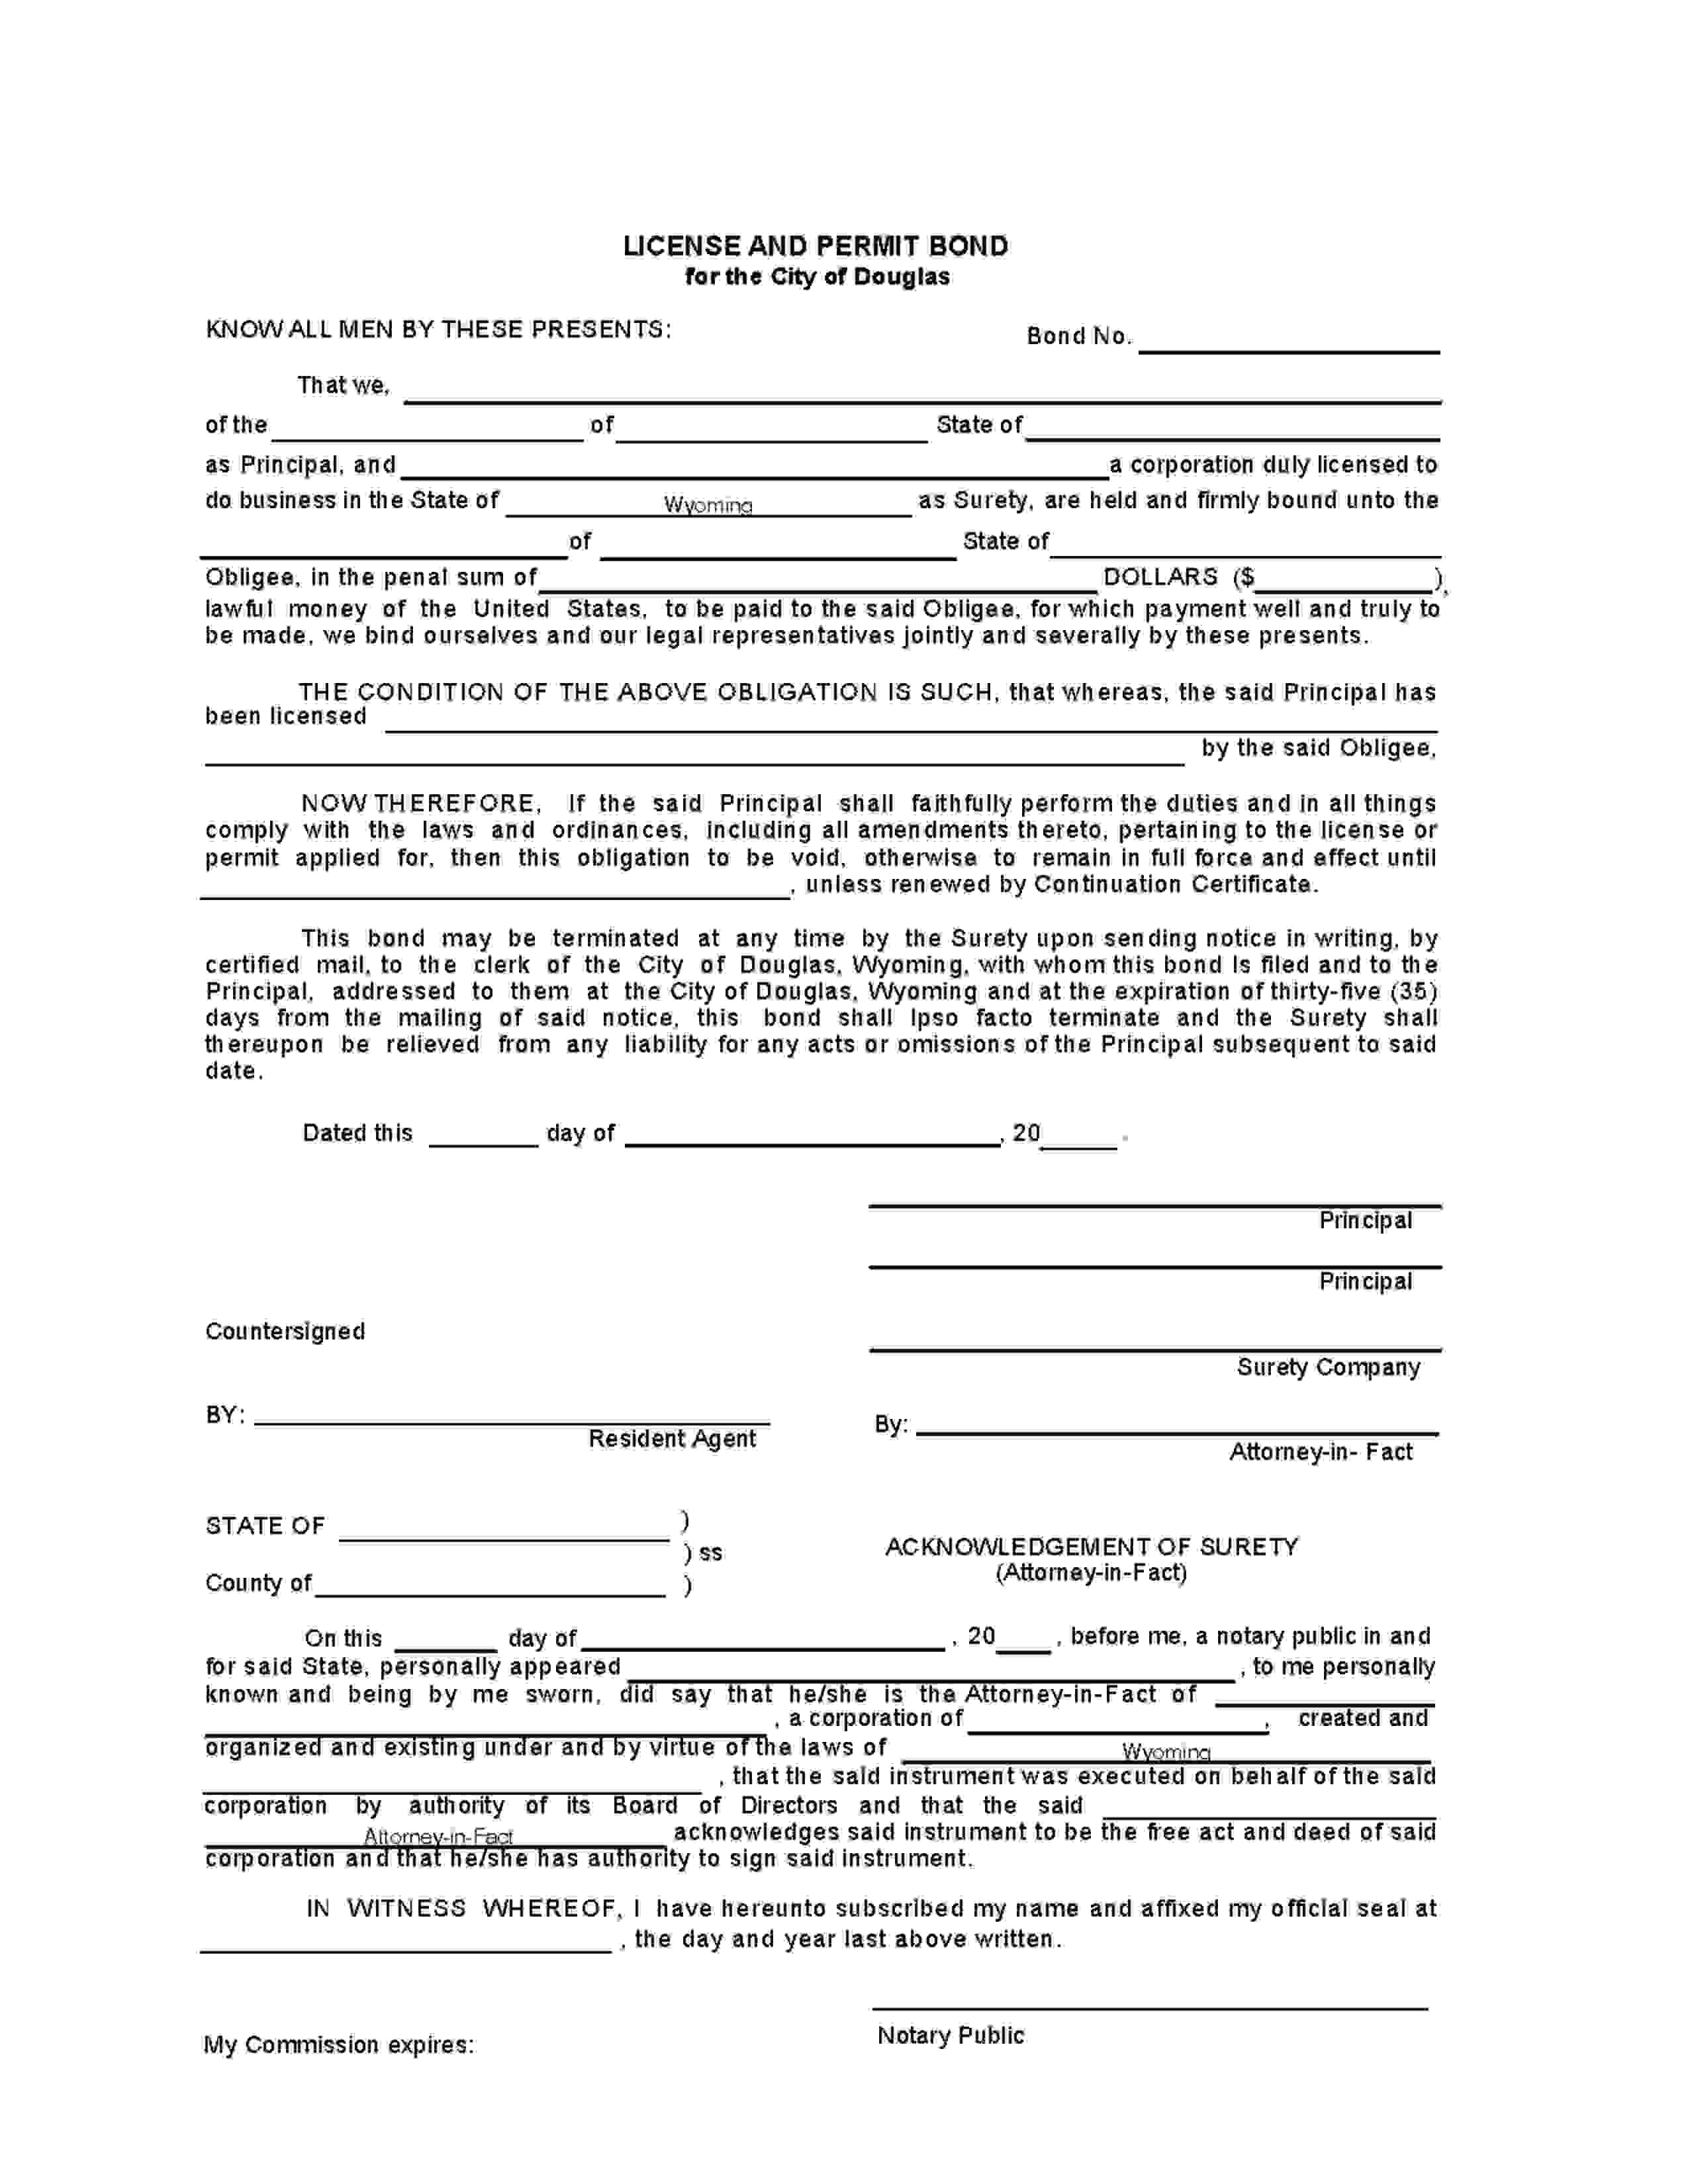 Douglas - City License/Permit sample image